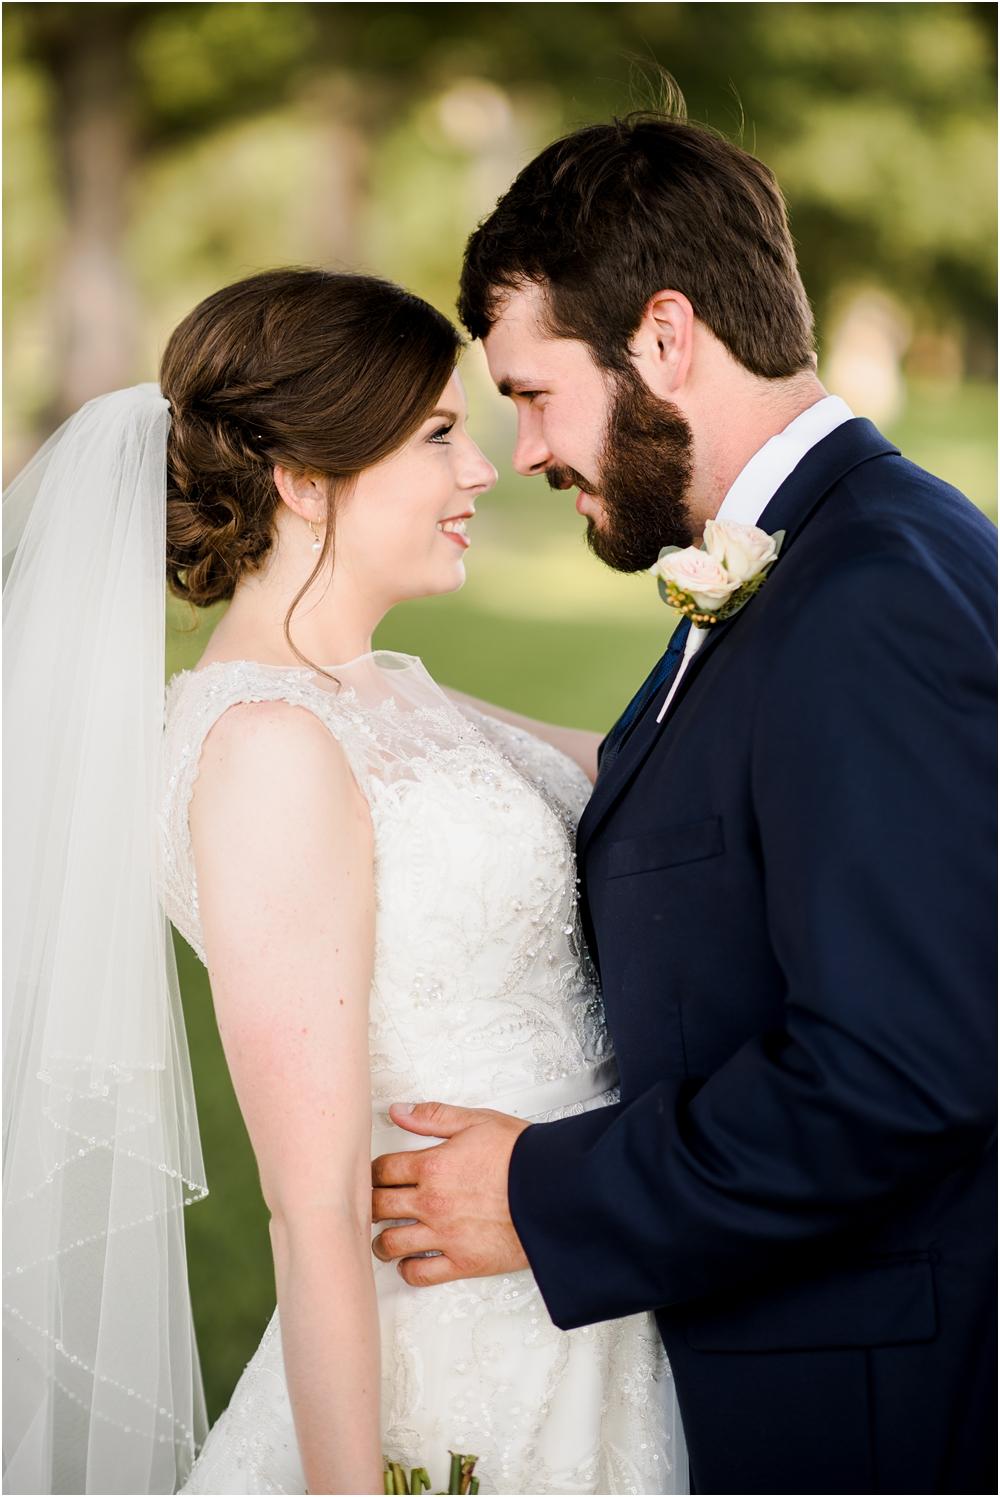 marianna-florida-wedding-photographer-kiersten-grant-70.jpg